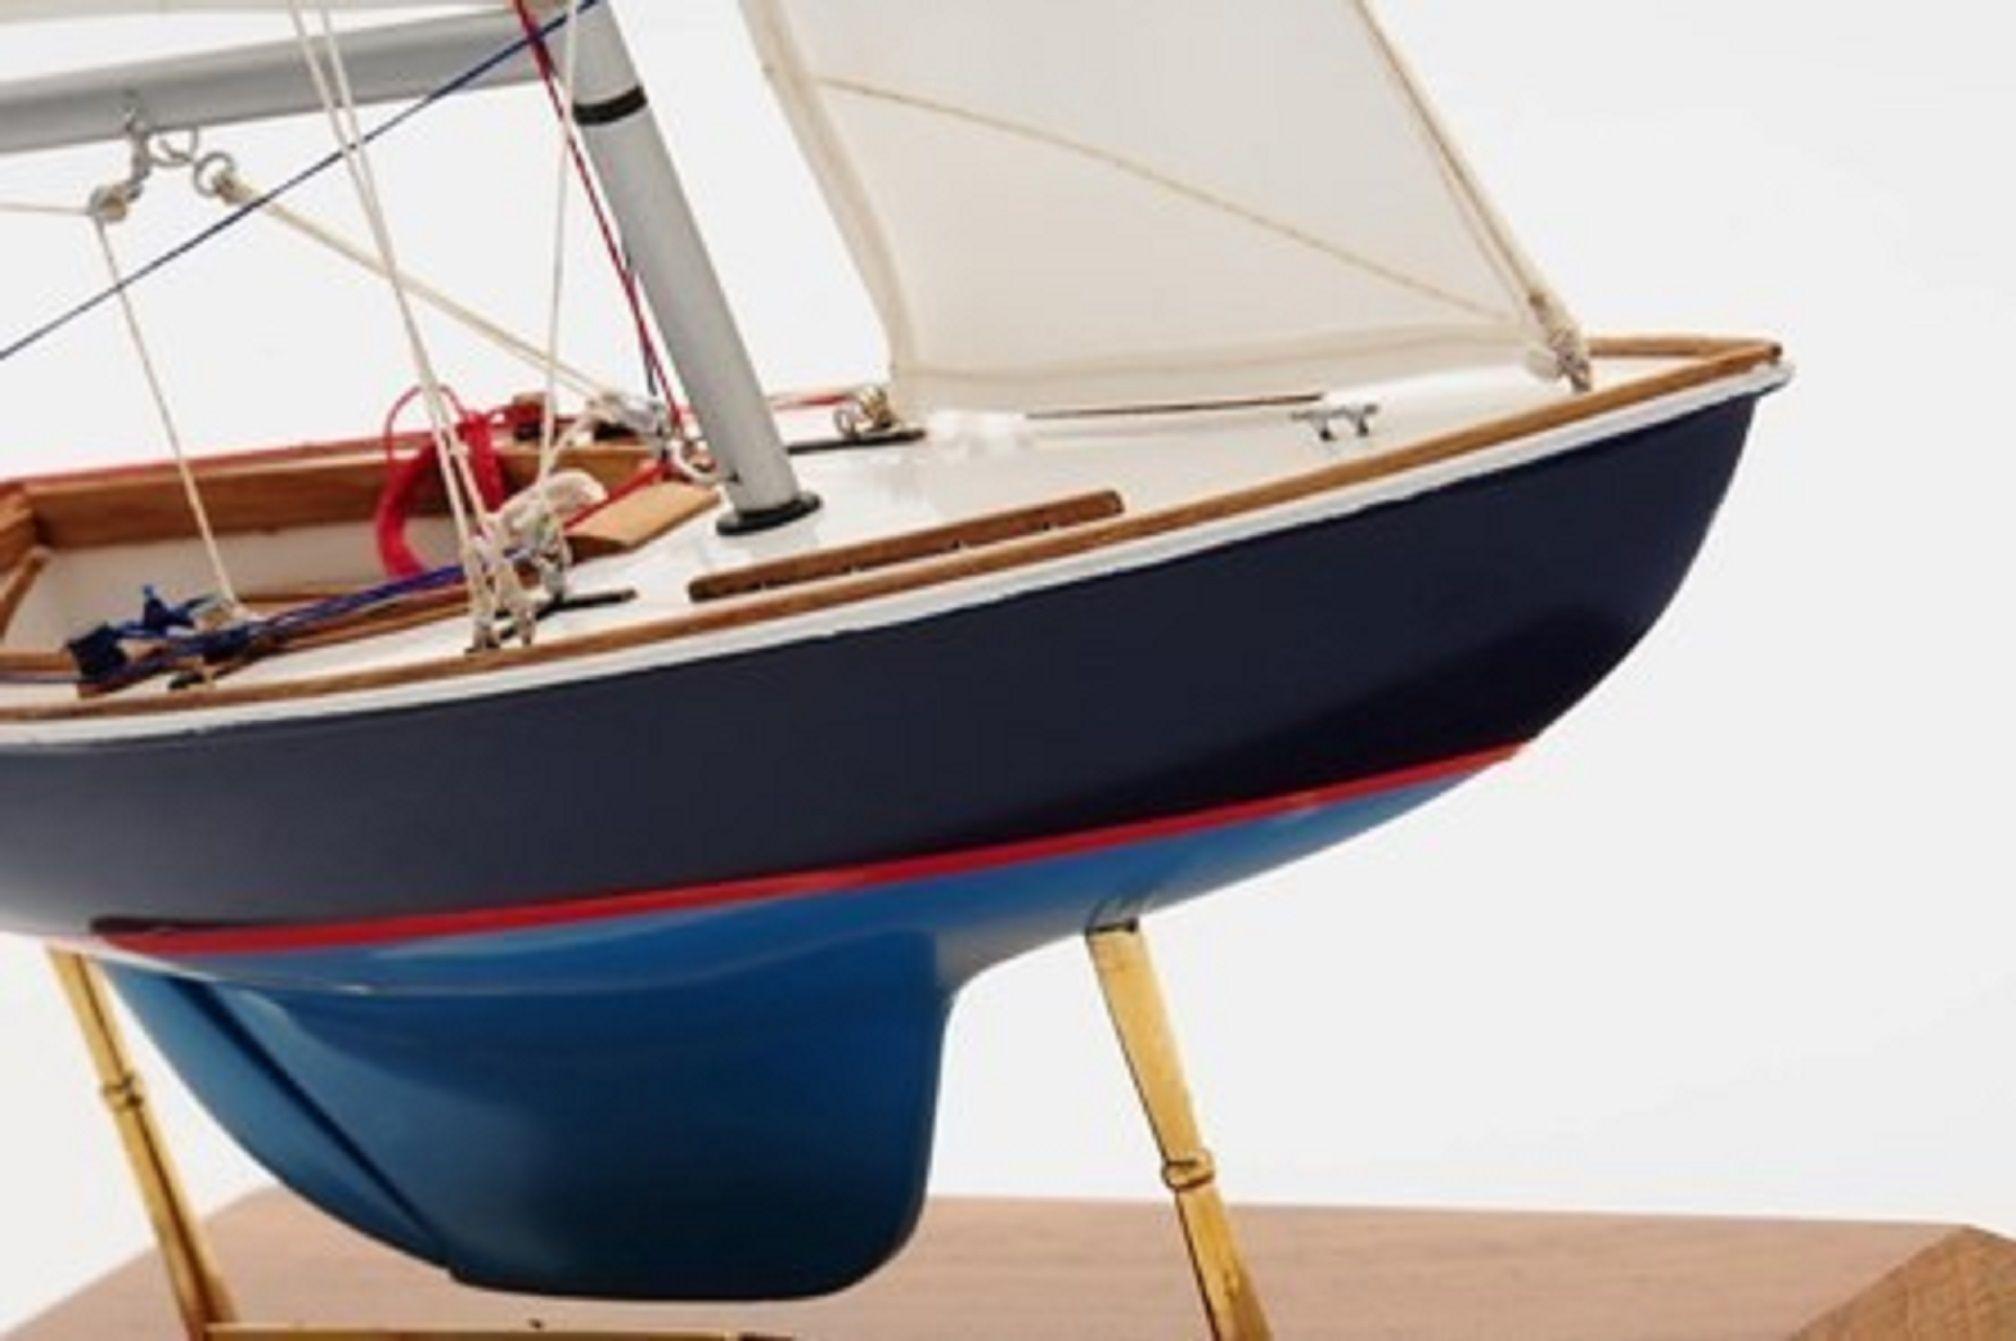 1230-7073-Sensation-Model-Yacht